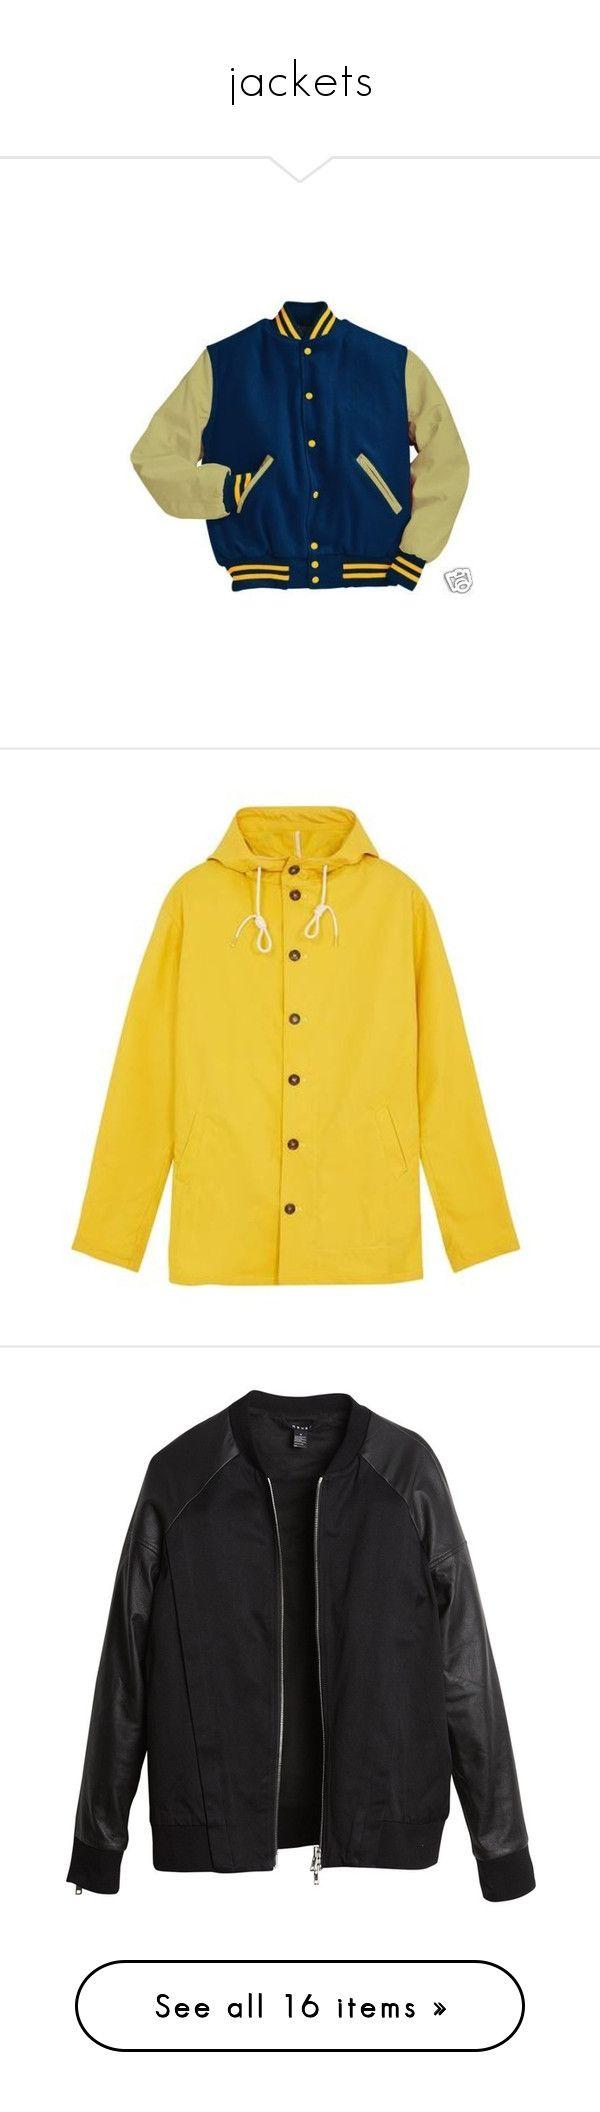 """jackets"" by falllingforyou ❤ liked on Polyvore featuring outerwear, jackets, tops, coats, woolen jacket, leather sleeve varsity jacket, teddy jacket, blue letterman jacket, letterman jacket and men's fashion"